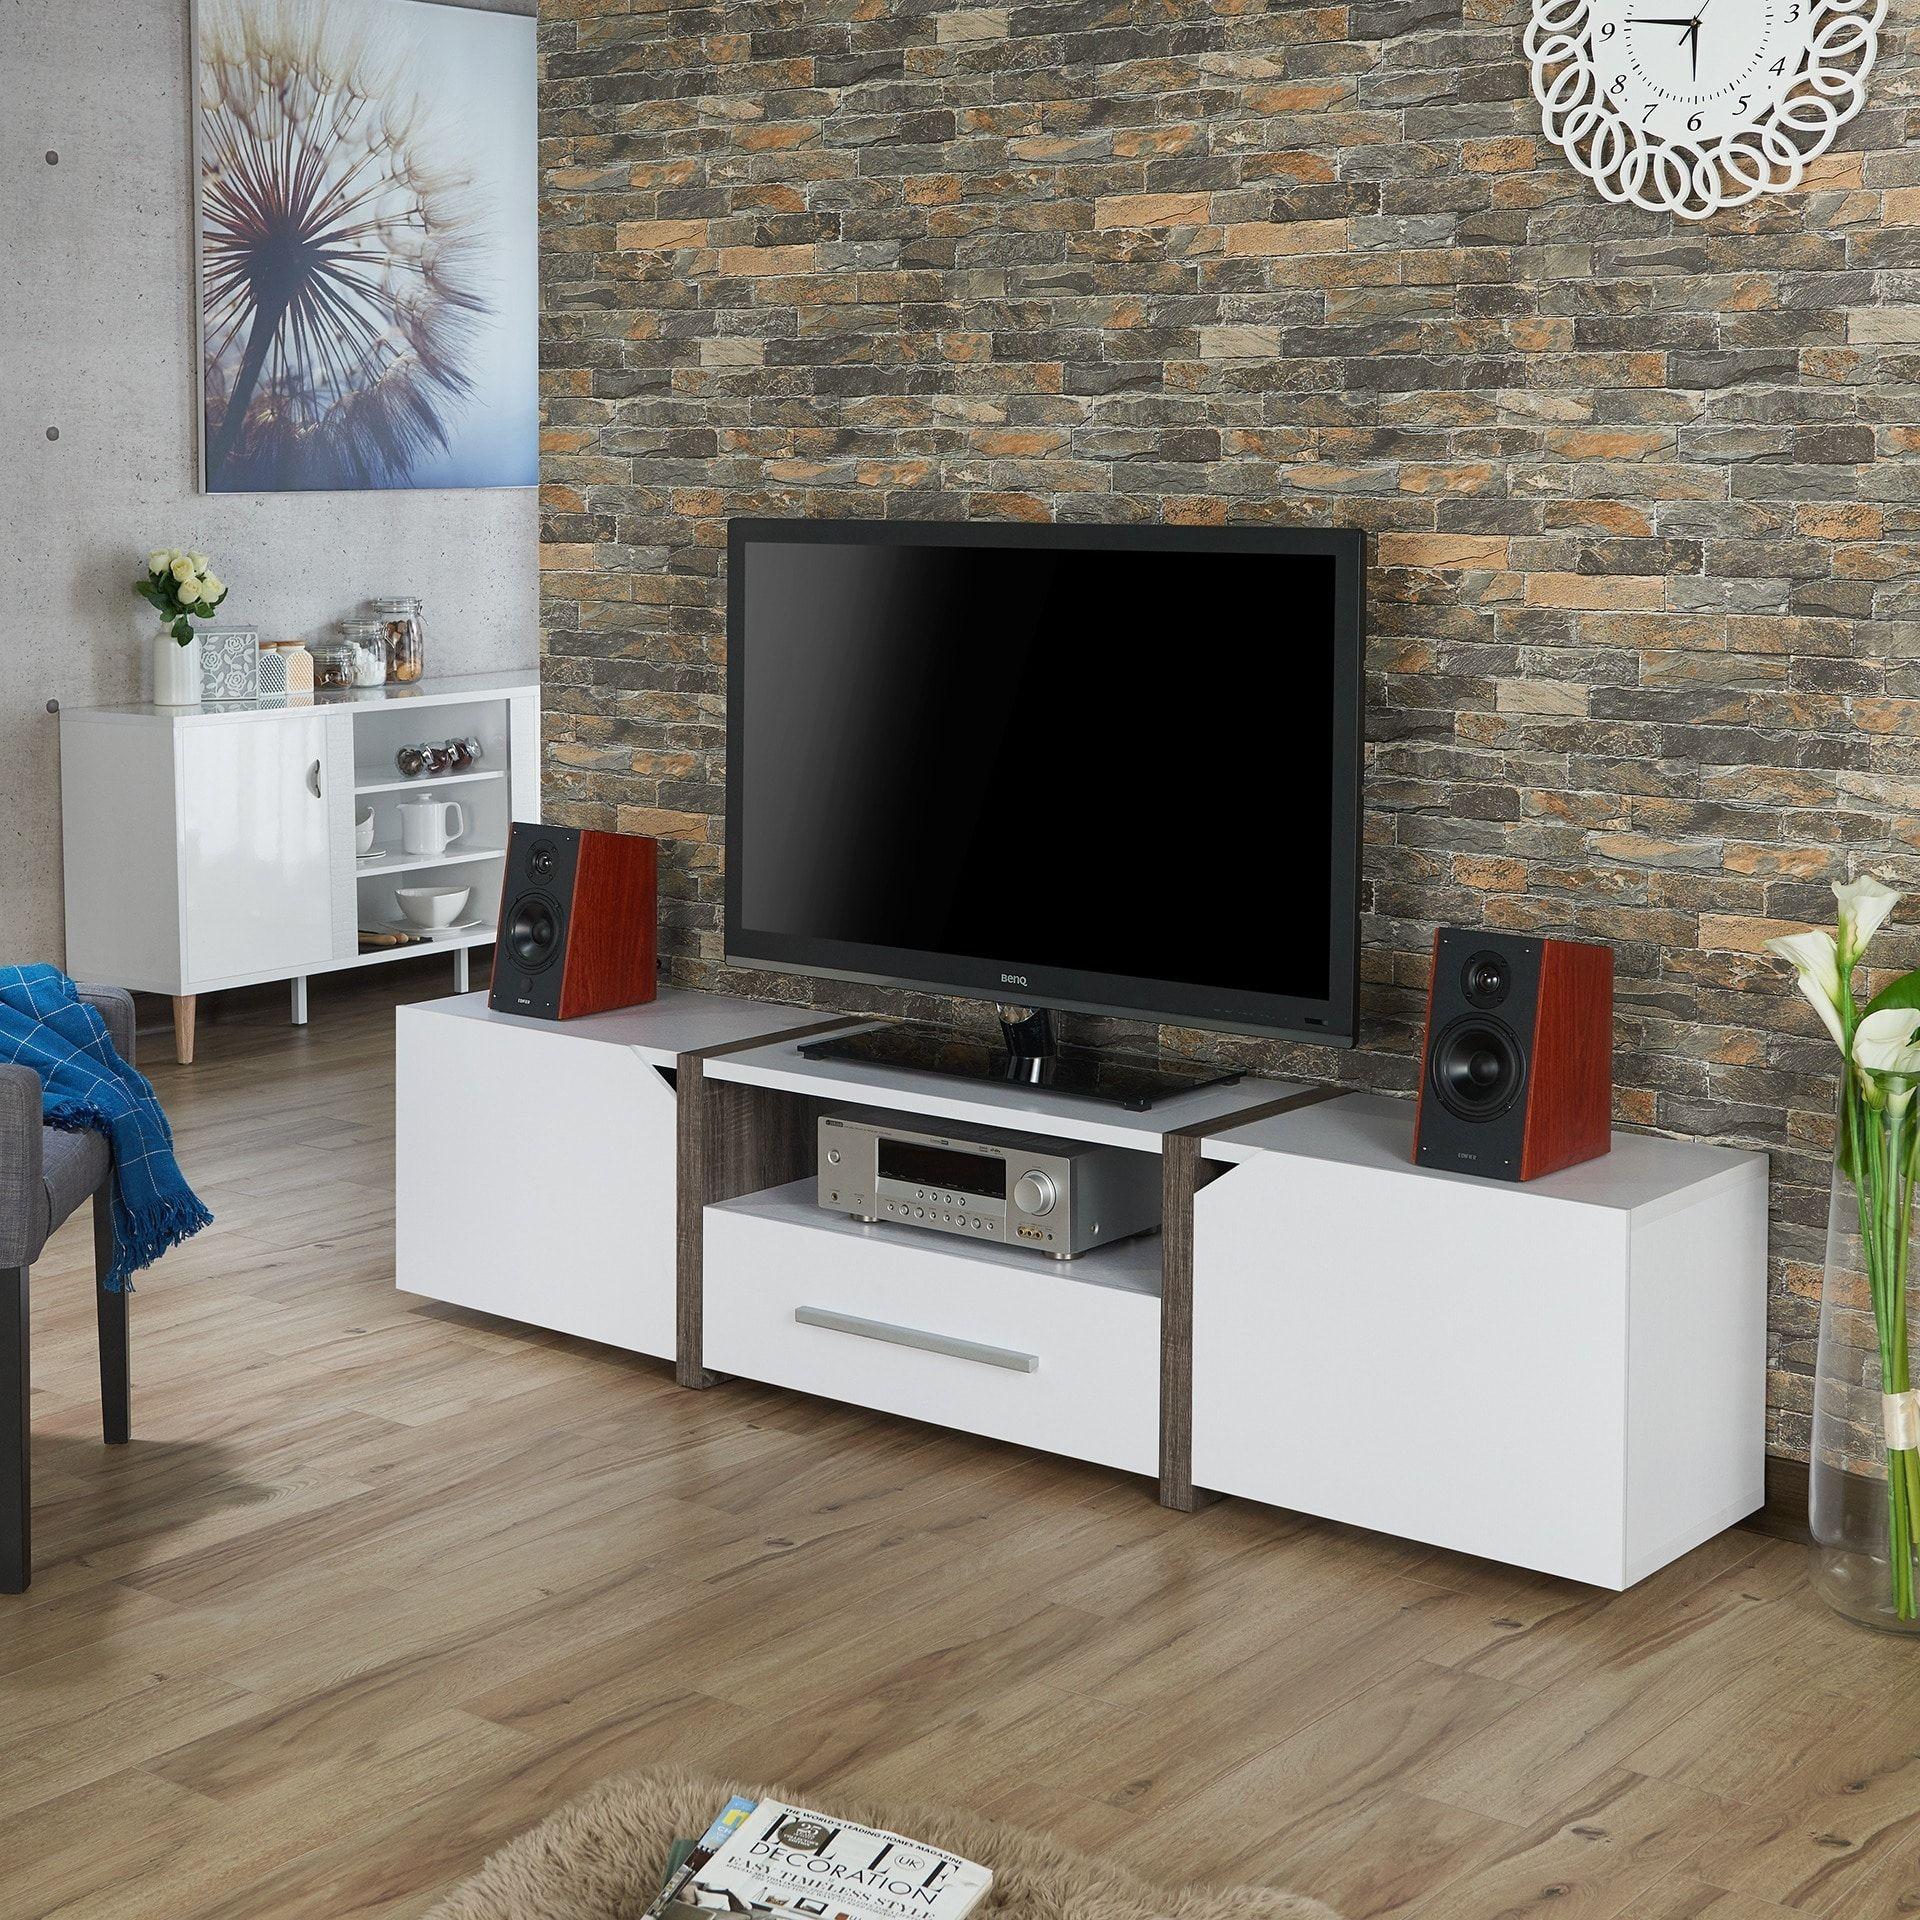 Furniture of America Glenad Modern Multi storage 81 inch TV Stand